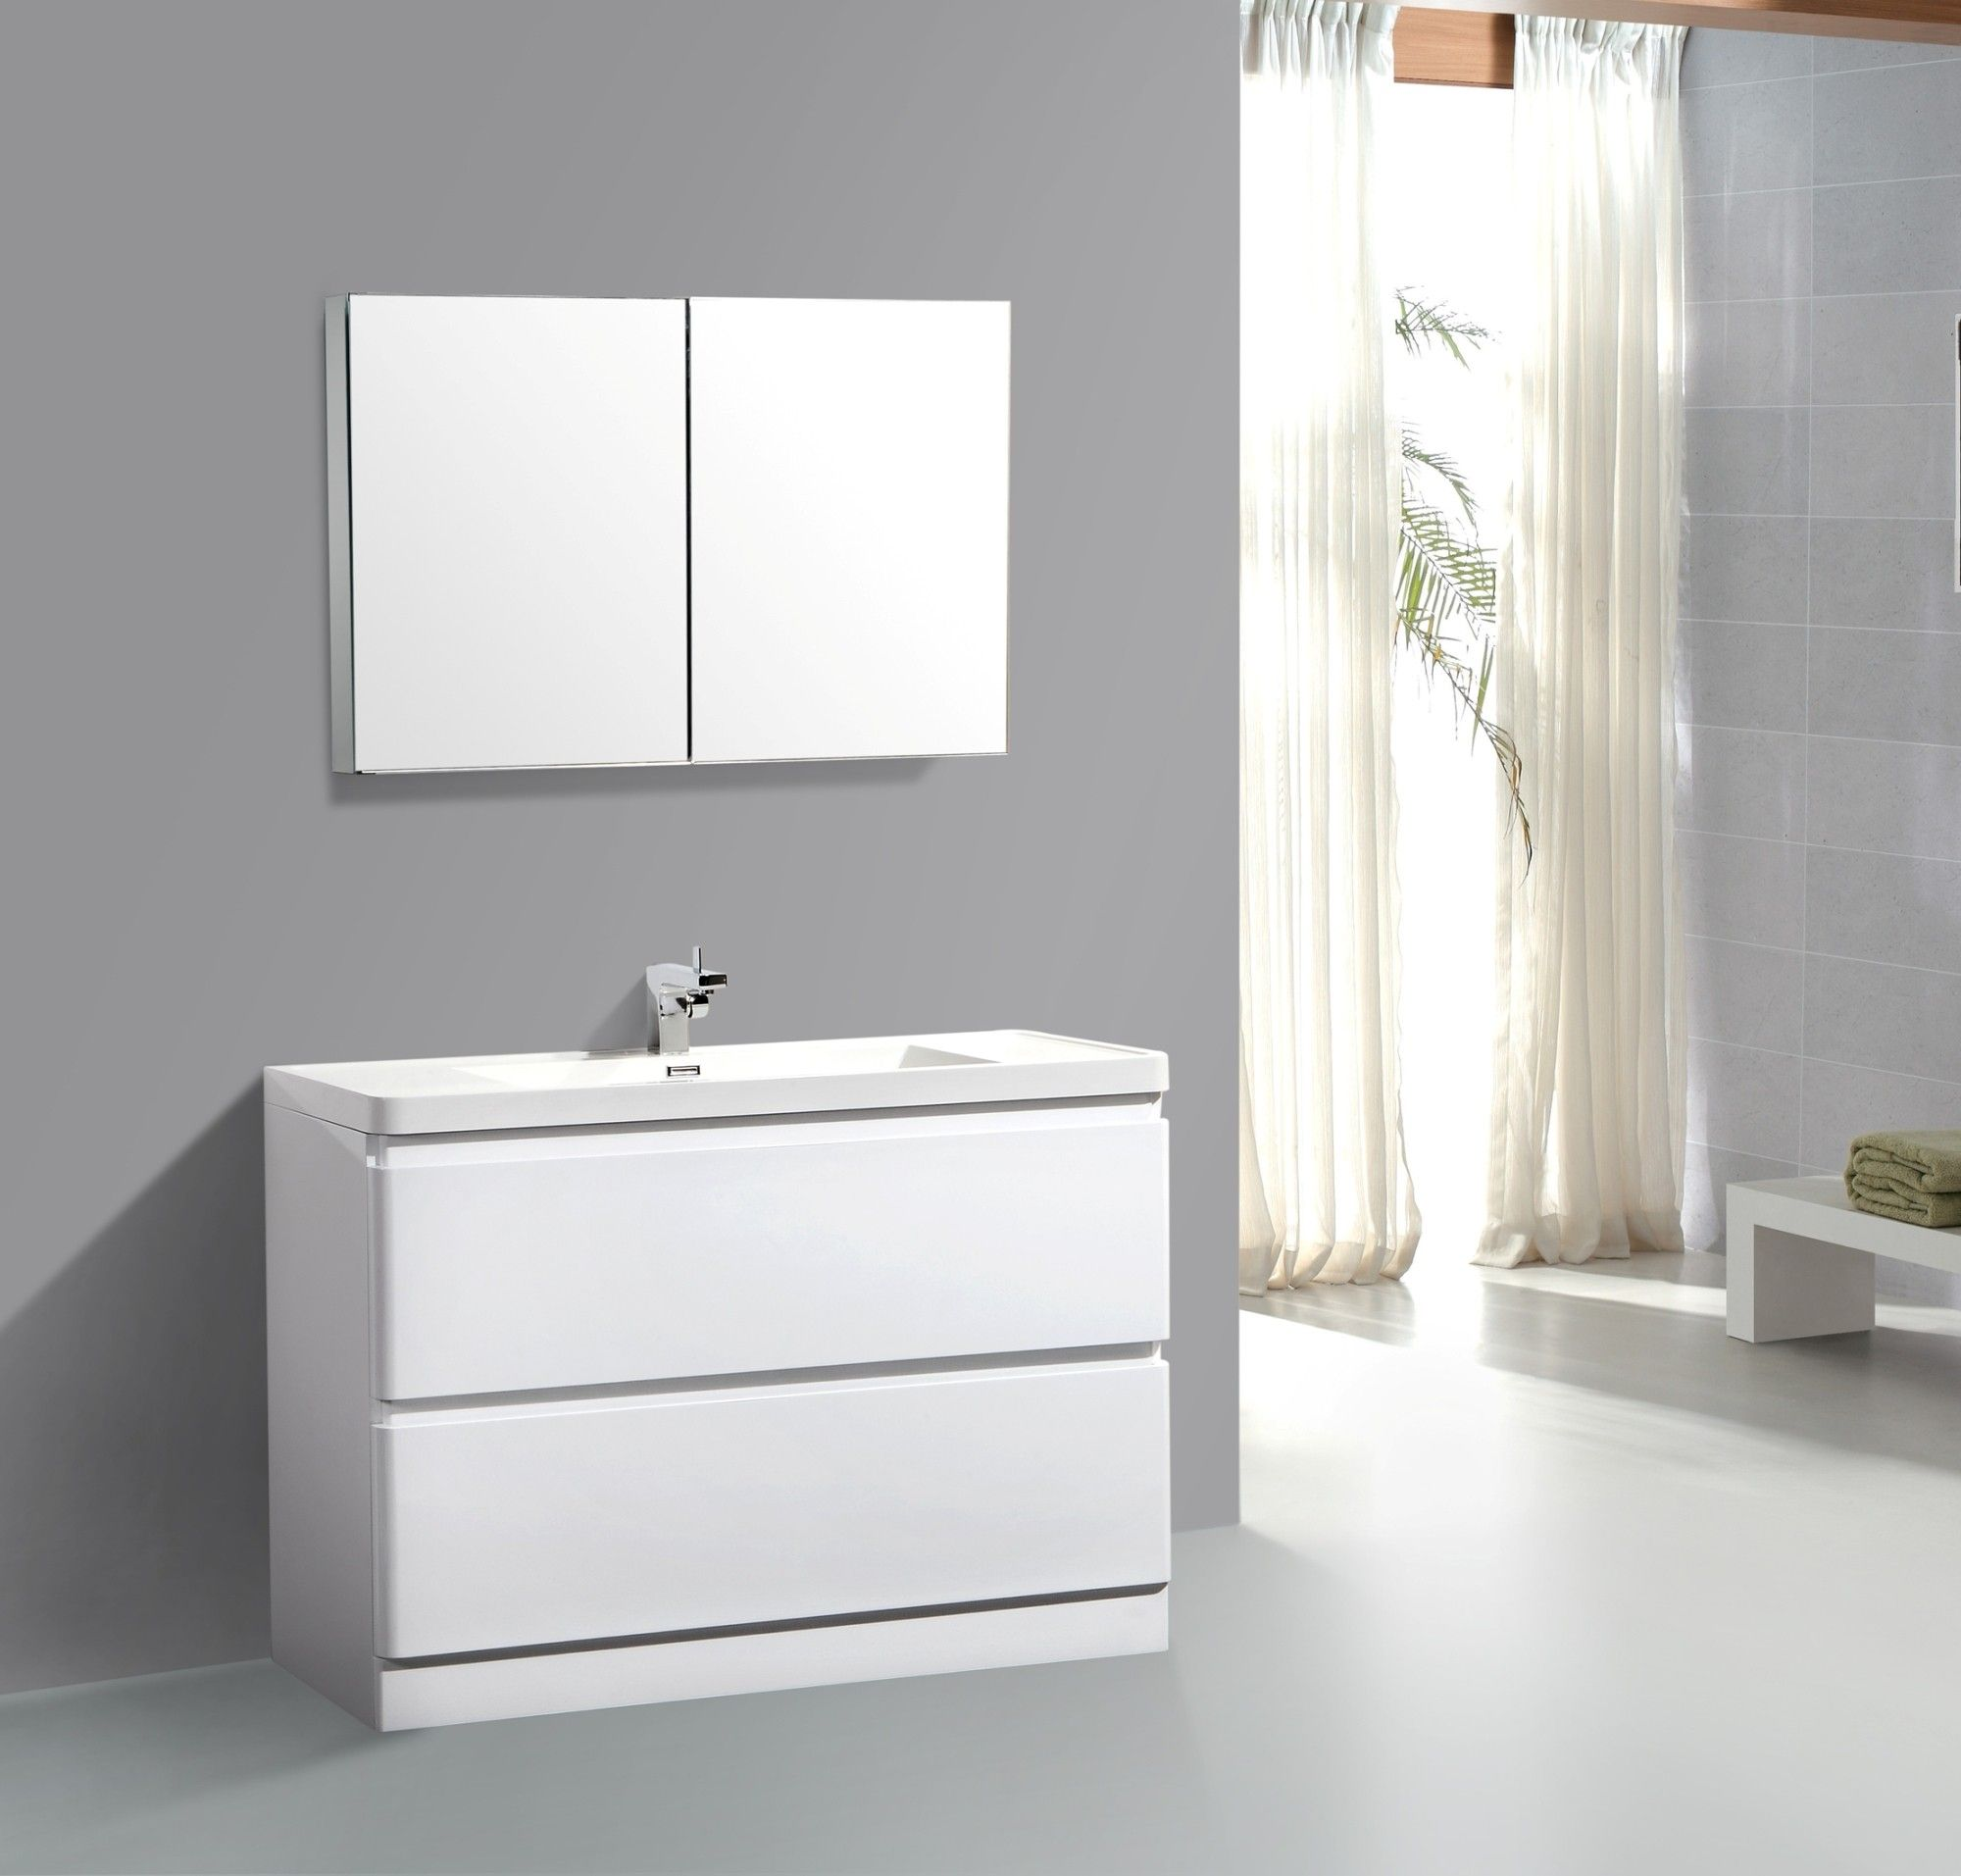 "Aqua Decor Glaciar 48"" Modern Bathroom Vanity Set W Medicine Mesmerizing Designer Bathroom Cabinet Inspiration Design"